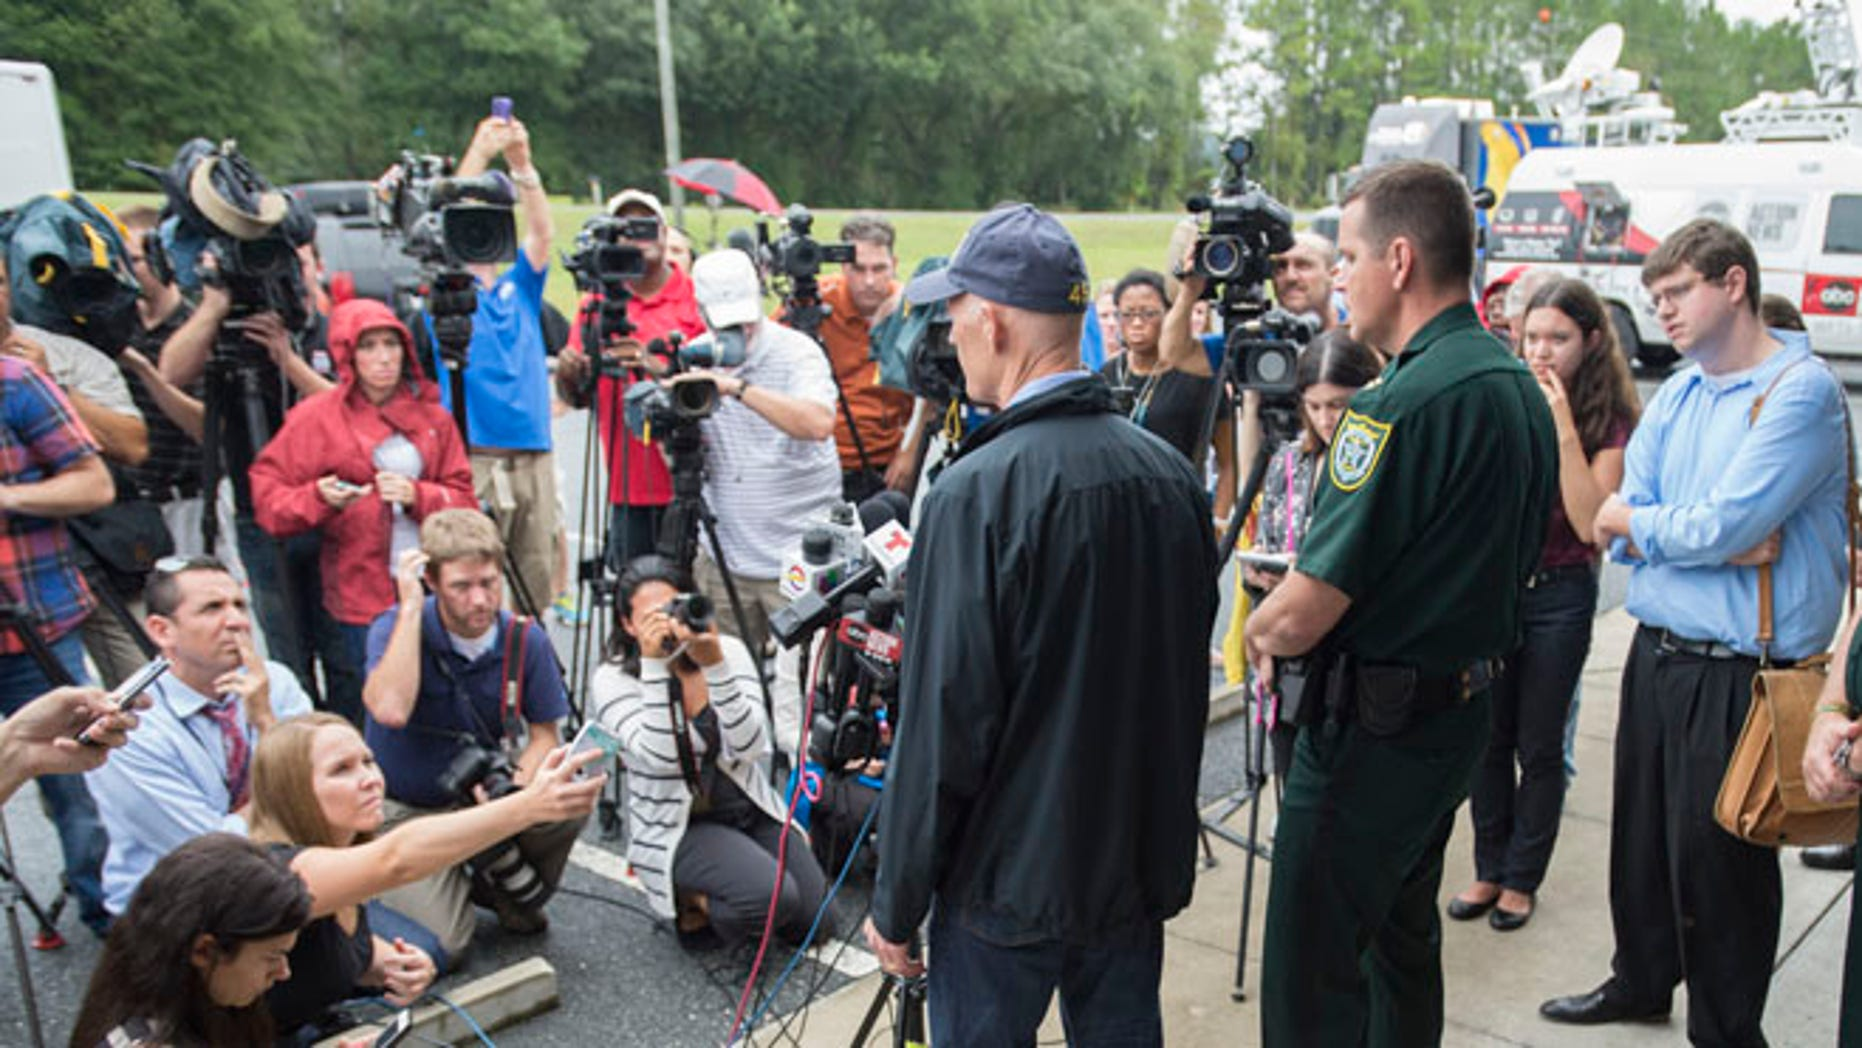 Sept. 19, 2014: Florida Gov. Rick Scott, left, and Gilcrist county sheriff Robert Schultz, right, talk to the media